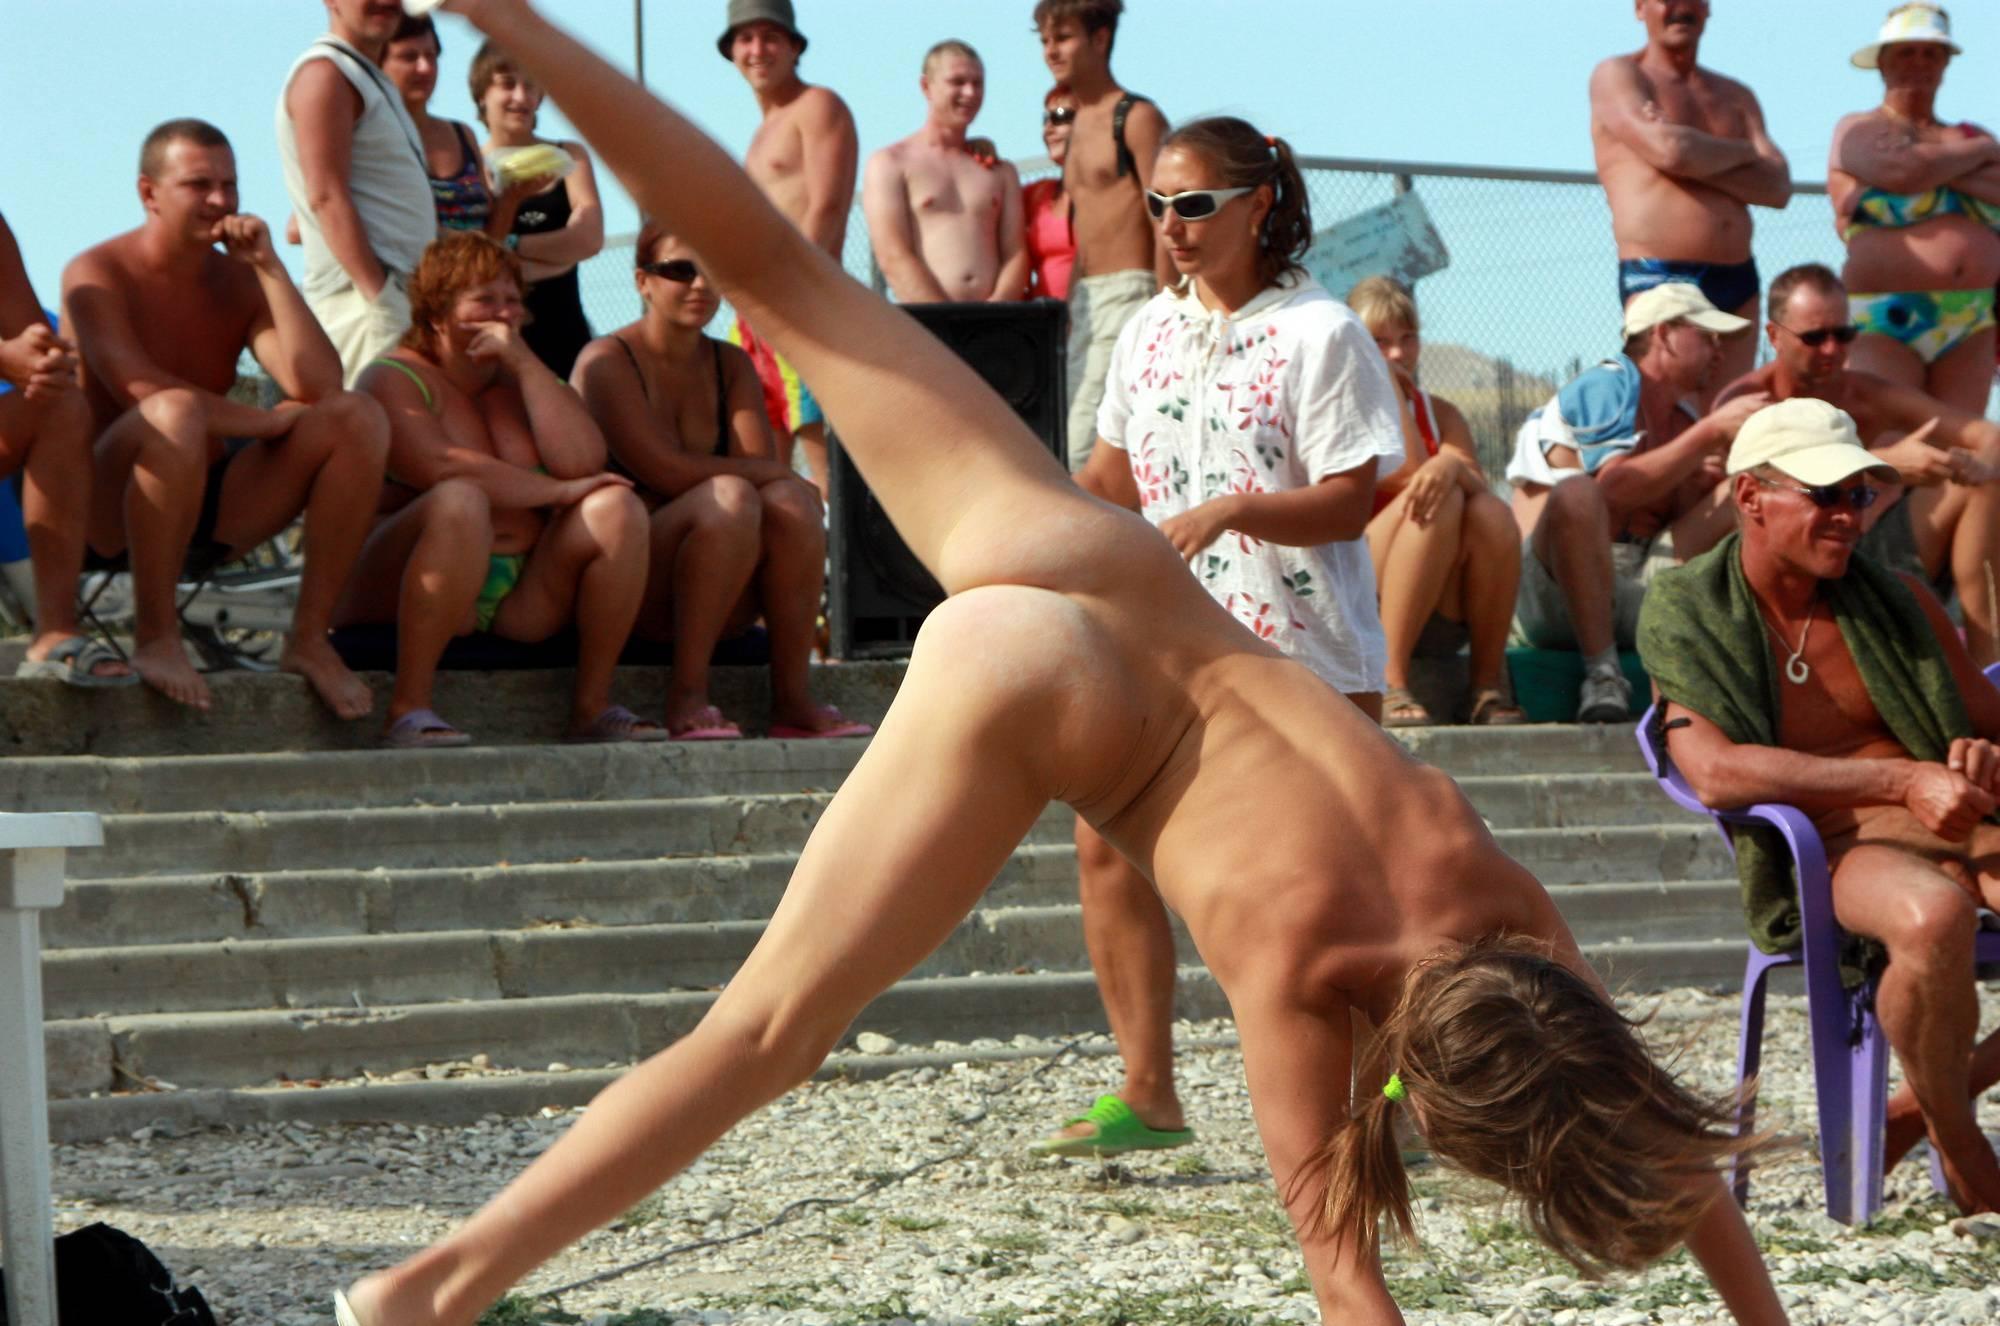 Cartwheel and Beach Dance - 4